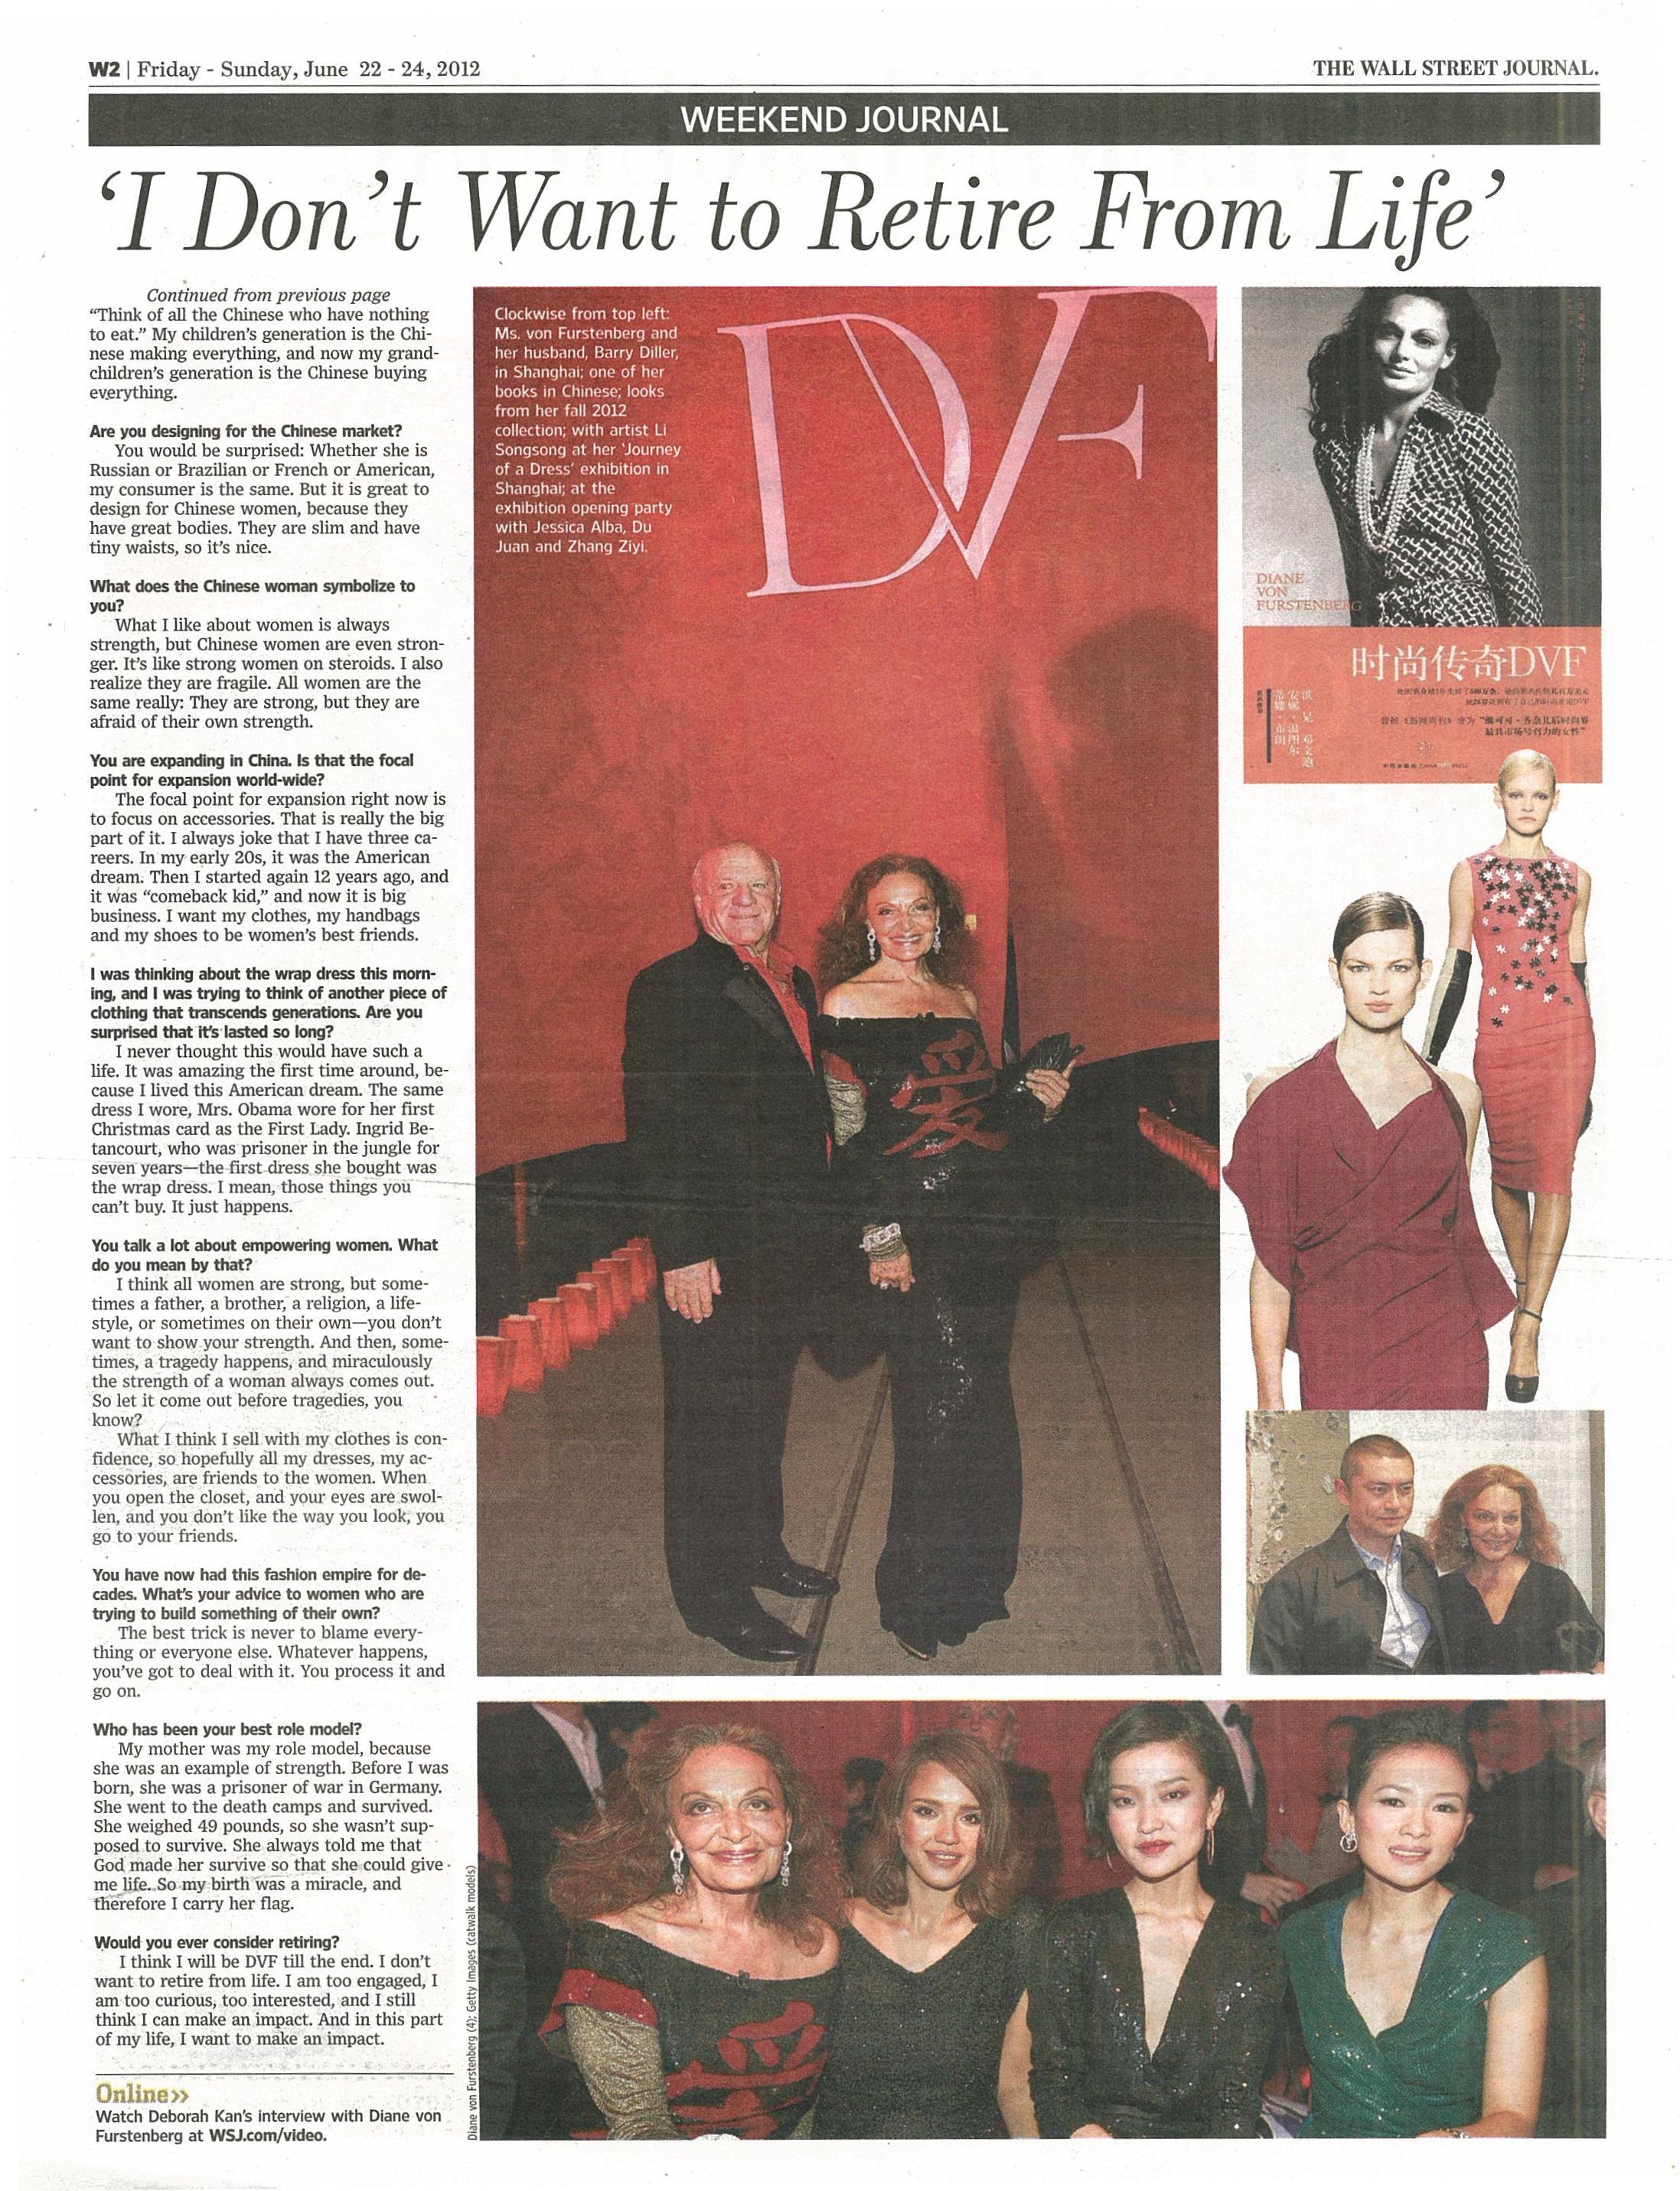 HK The Wall Street Journal Asia 02 - 22-24 Jun 12.jpg